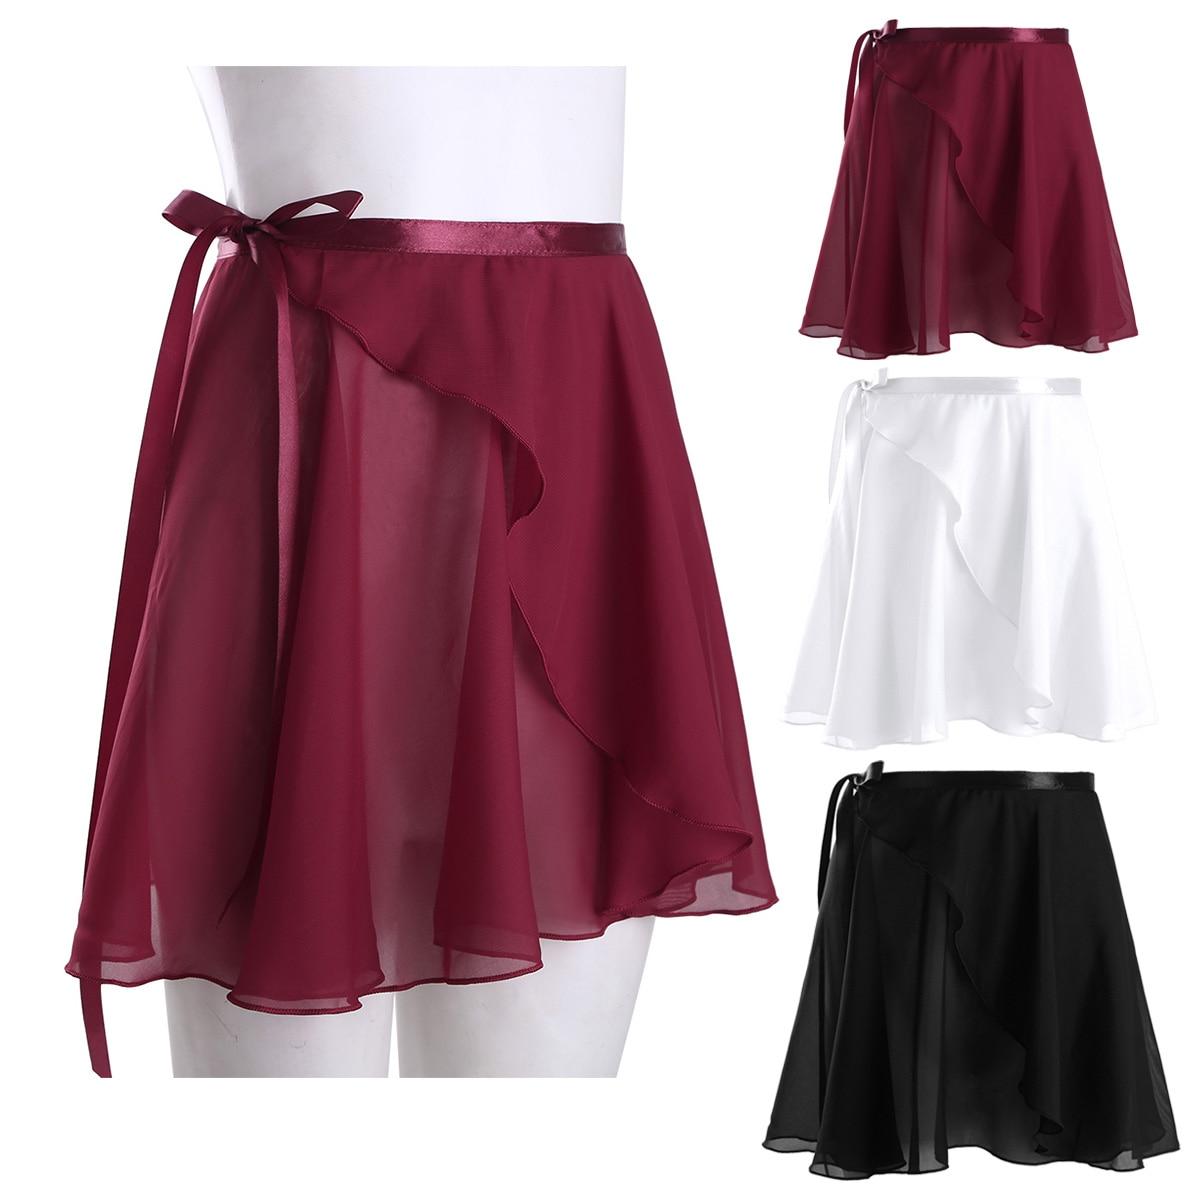 Kid Children Ballet Tutu Dance Chiffon Skirt Skate Dancewear Dress Girl-Costum